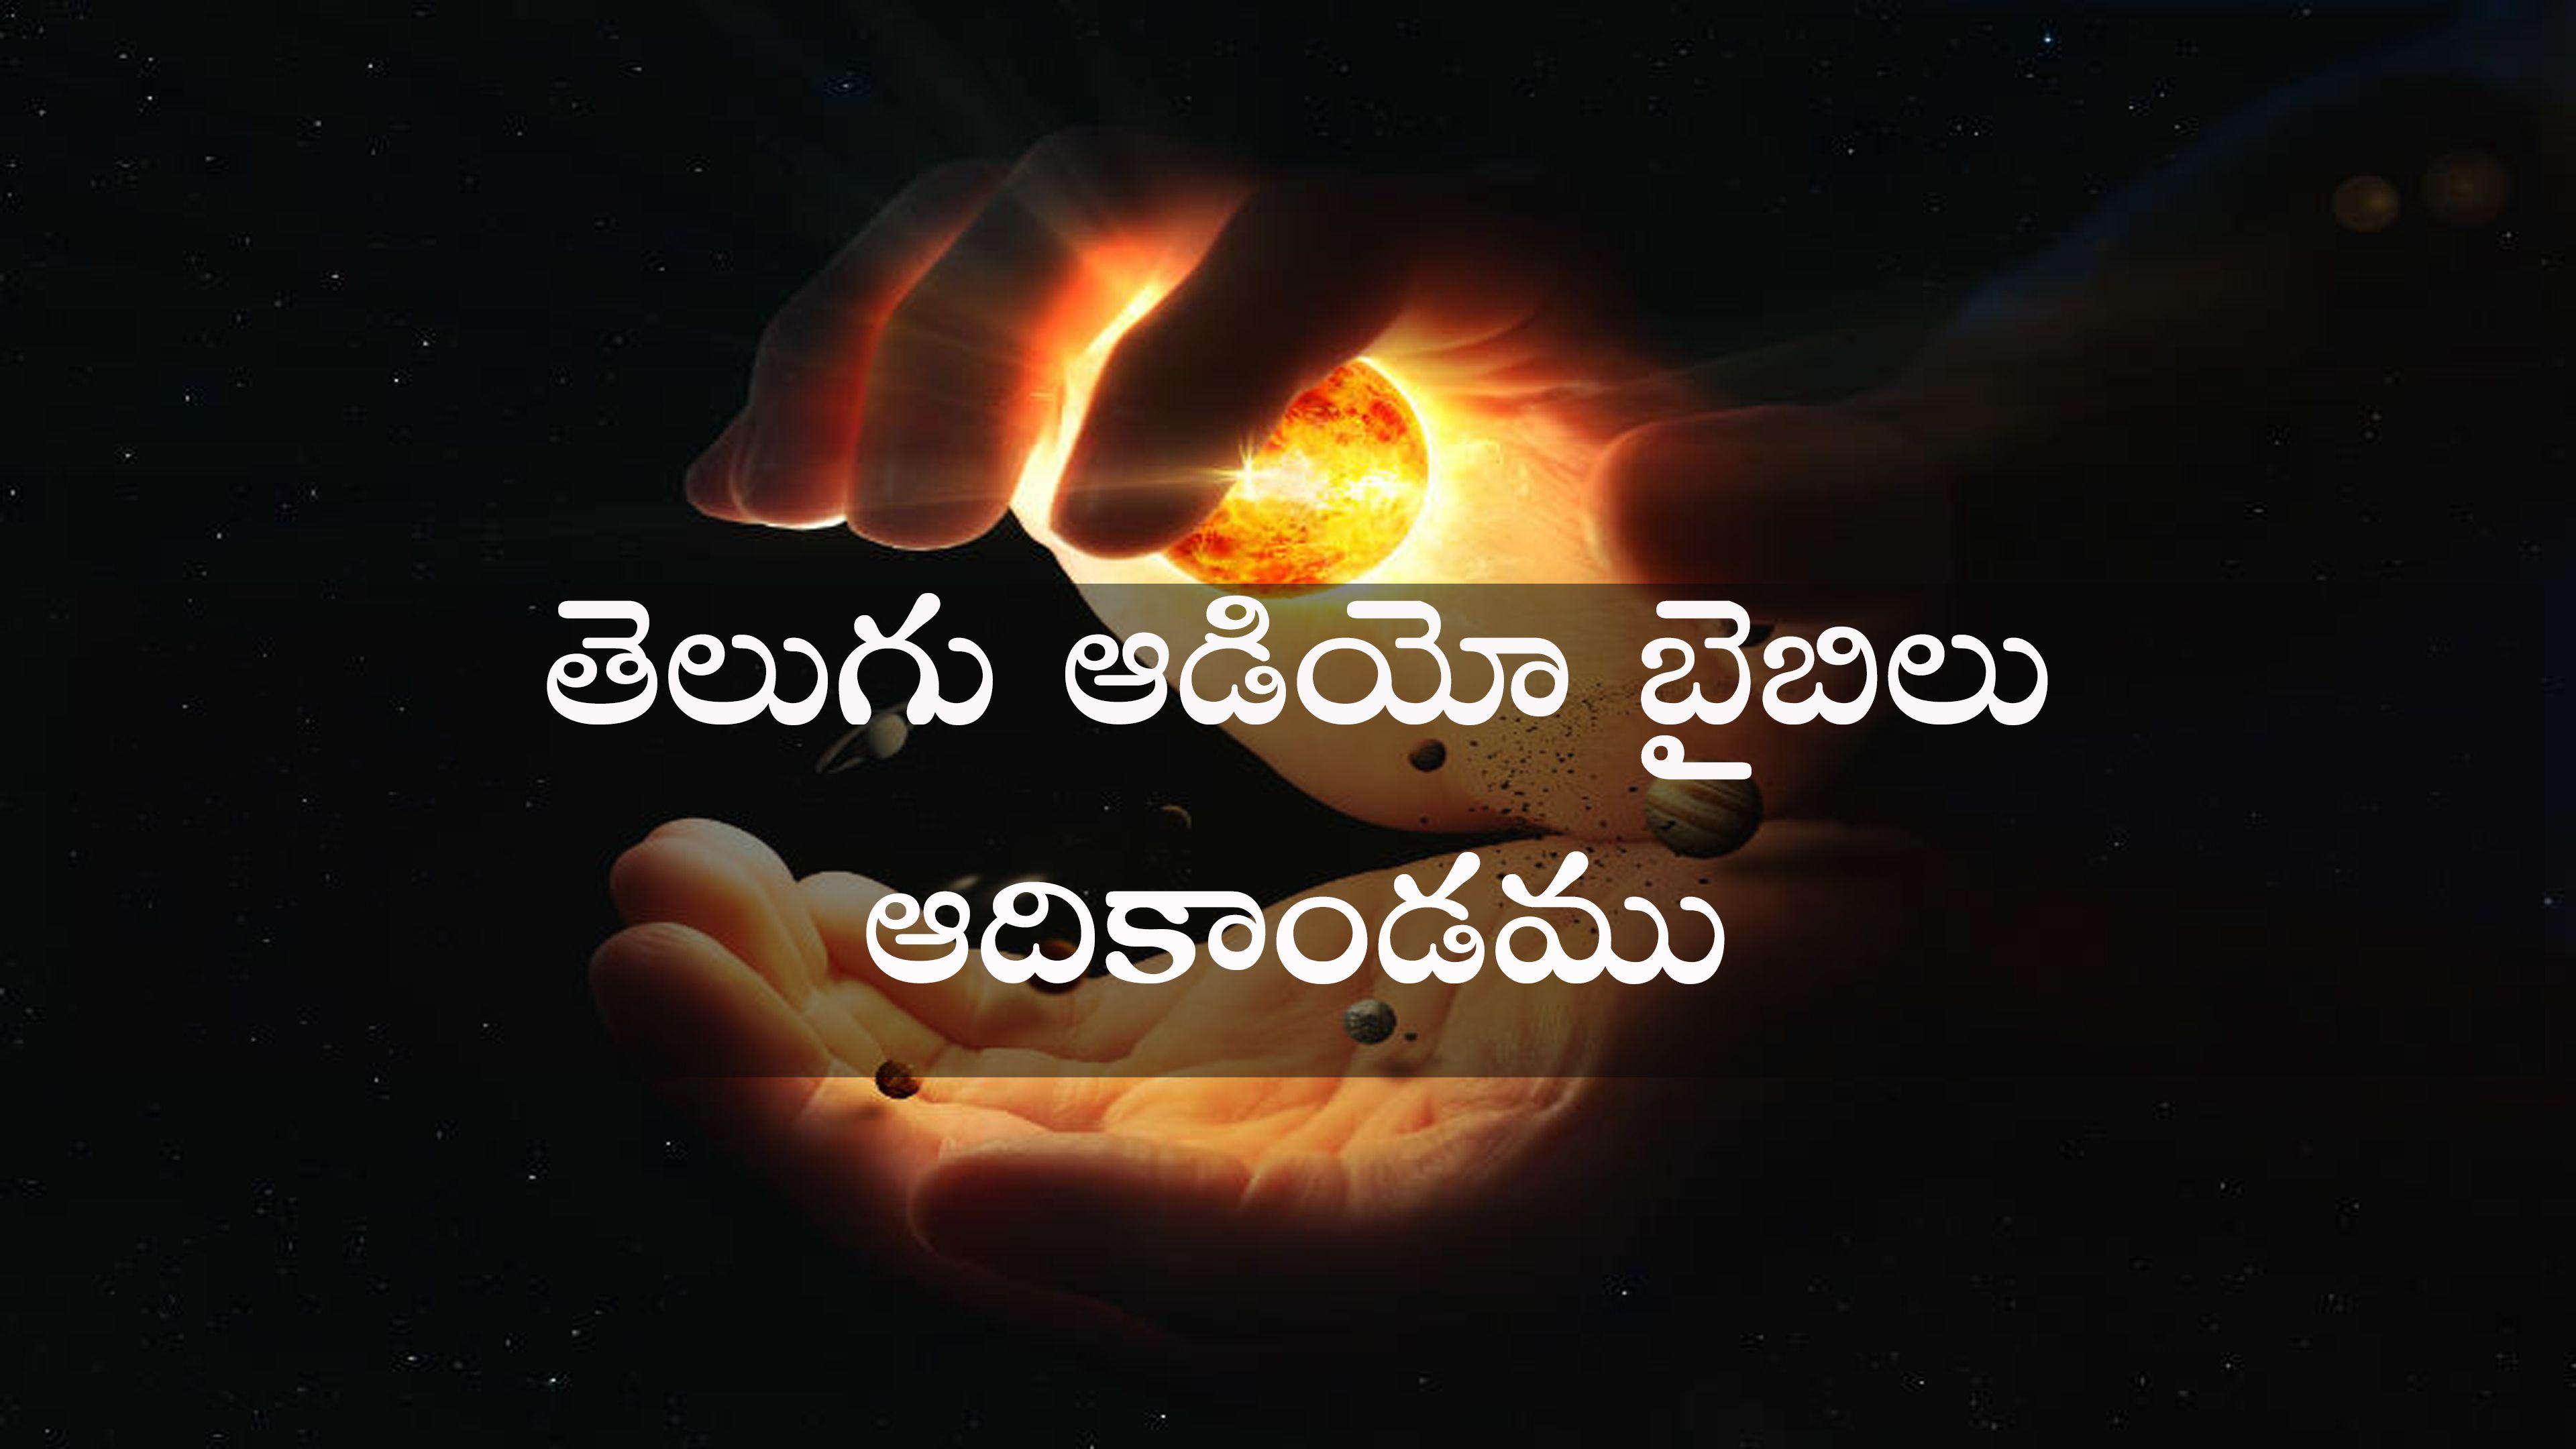 Book of genesis complete audio in telugu   Telugu Audio BIBLE